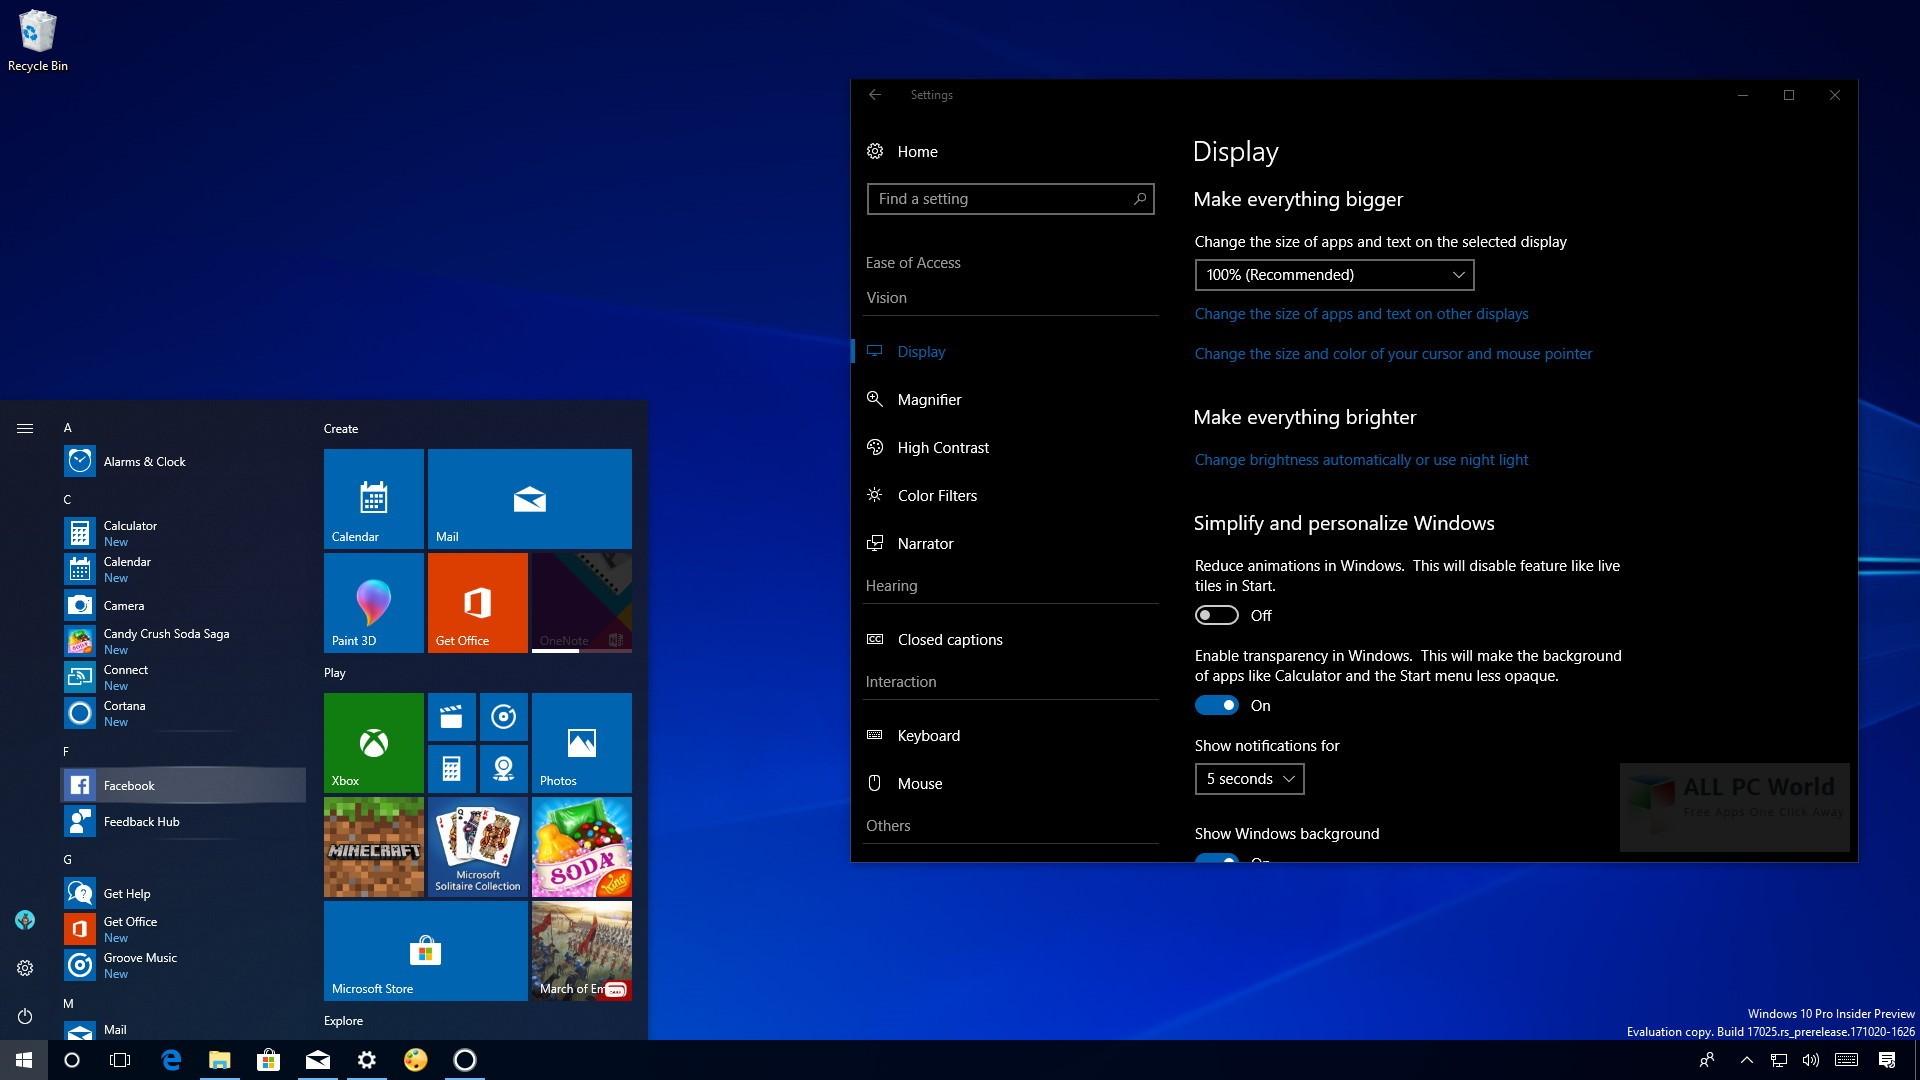 Windows 10 X64 Redstone 4 AIO JUNE 2018 Free Download